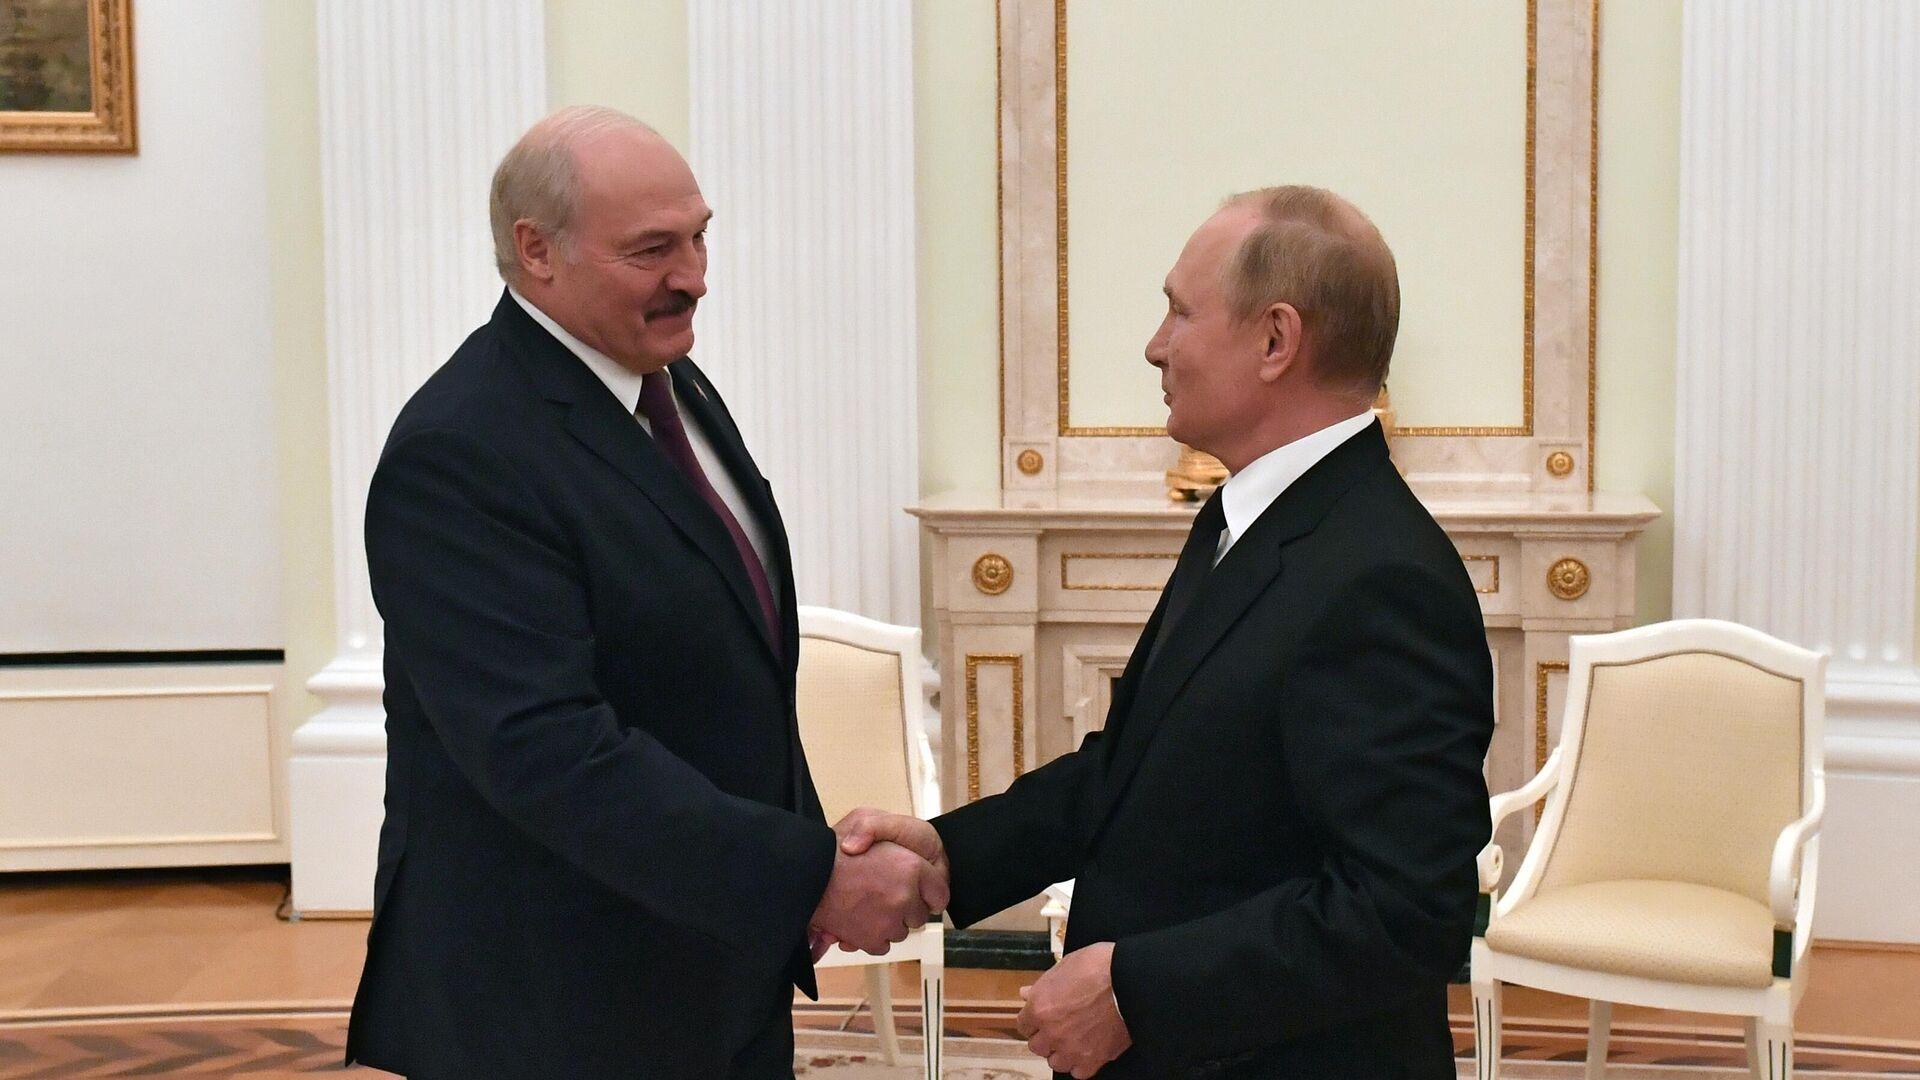 Президент РФ Владимир Путин и президент Белоруссии Александр Лукашенко во время встречи - РИА Новости, 1920, 09.09.2021